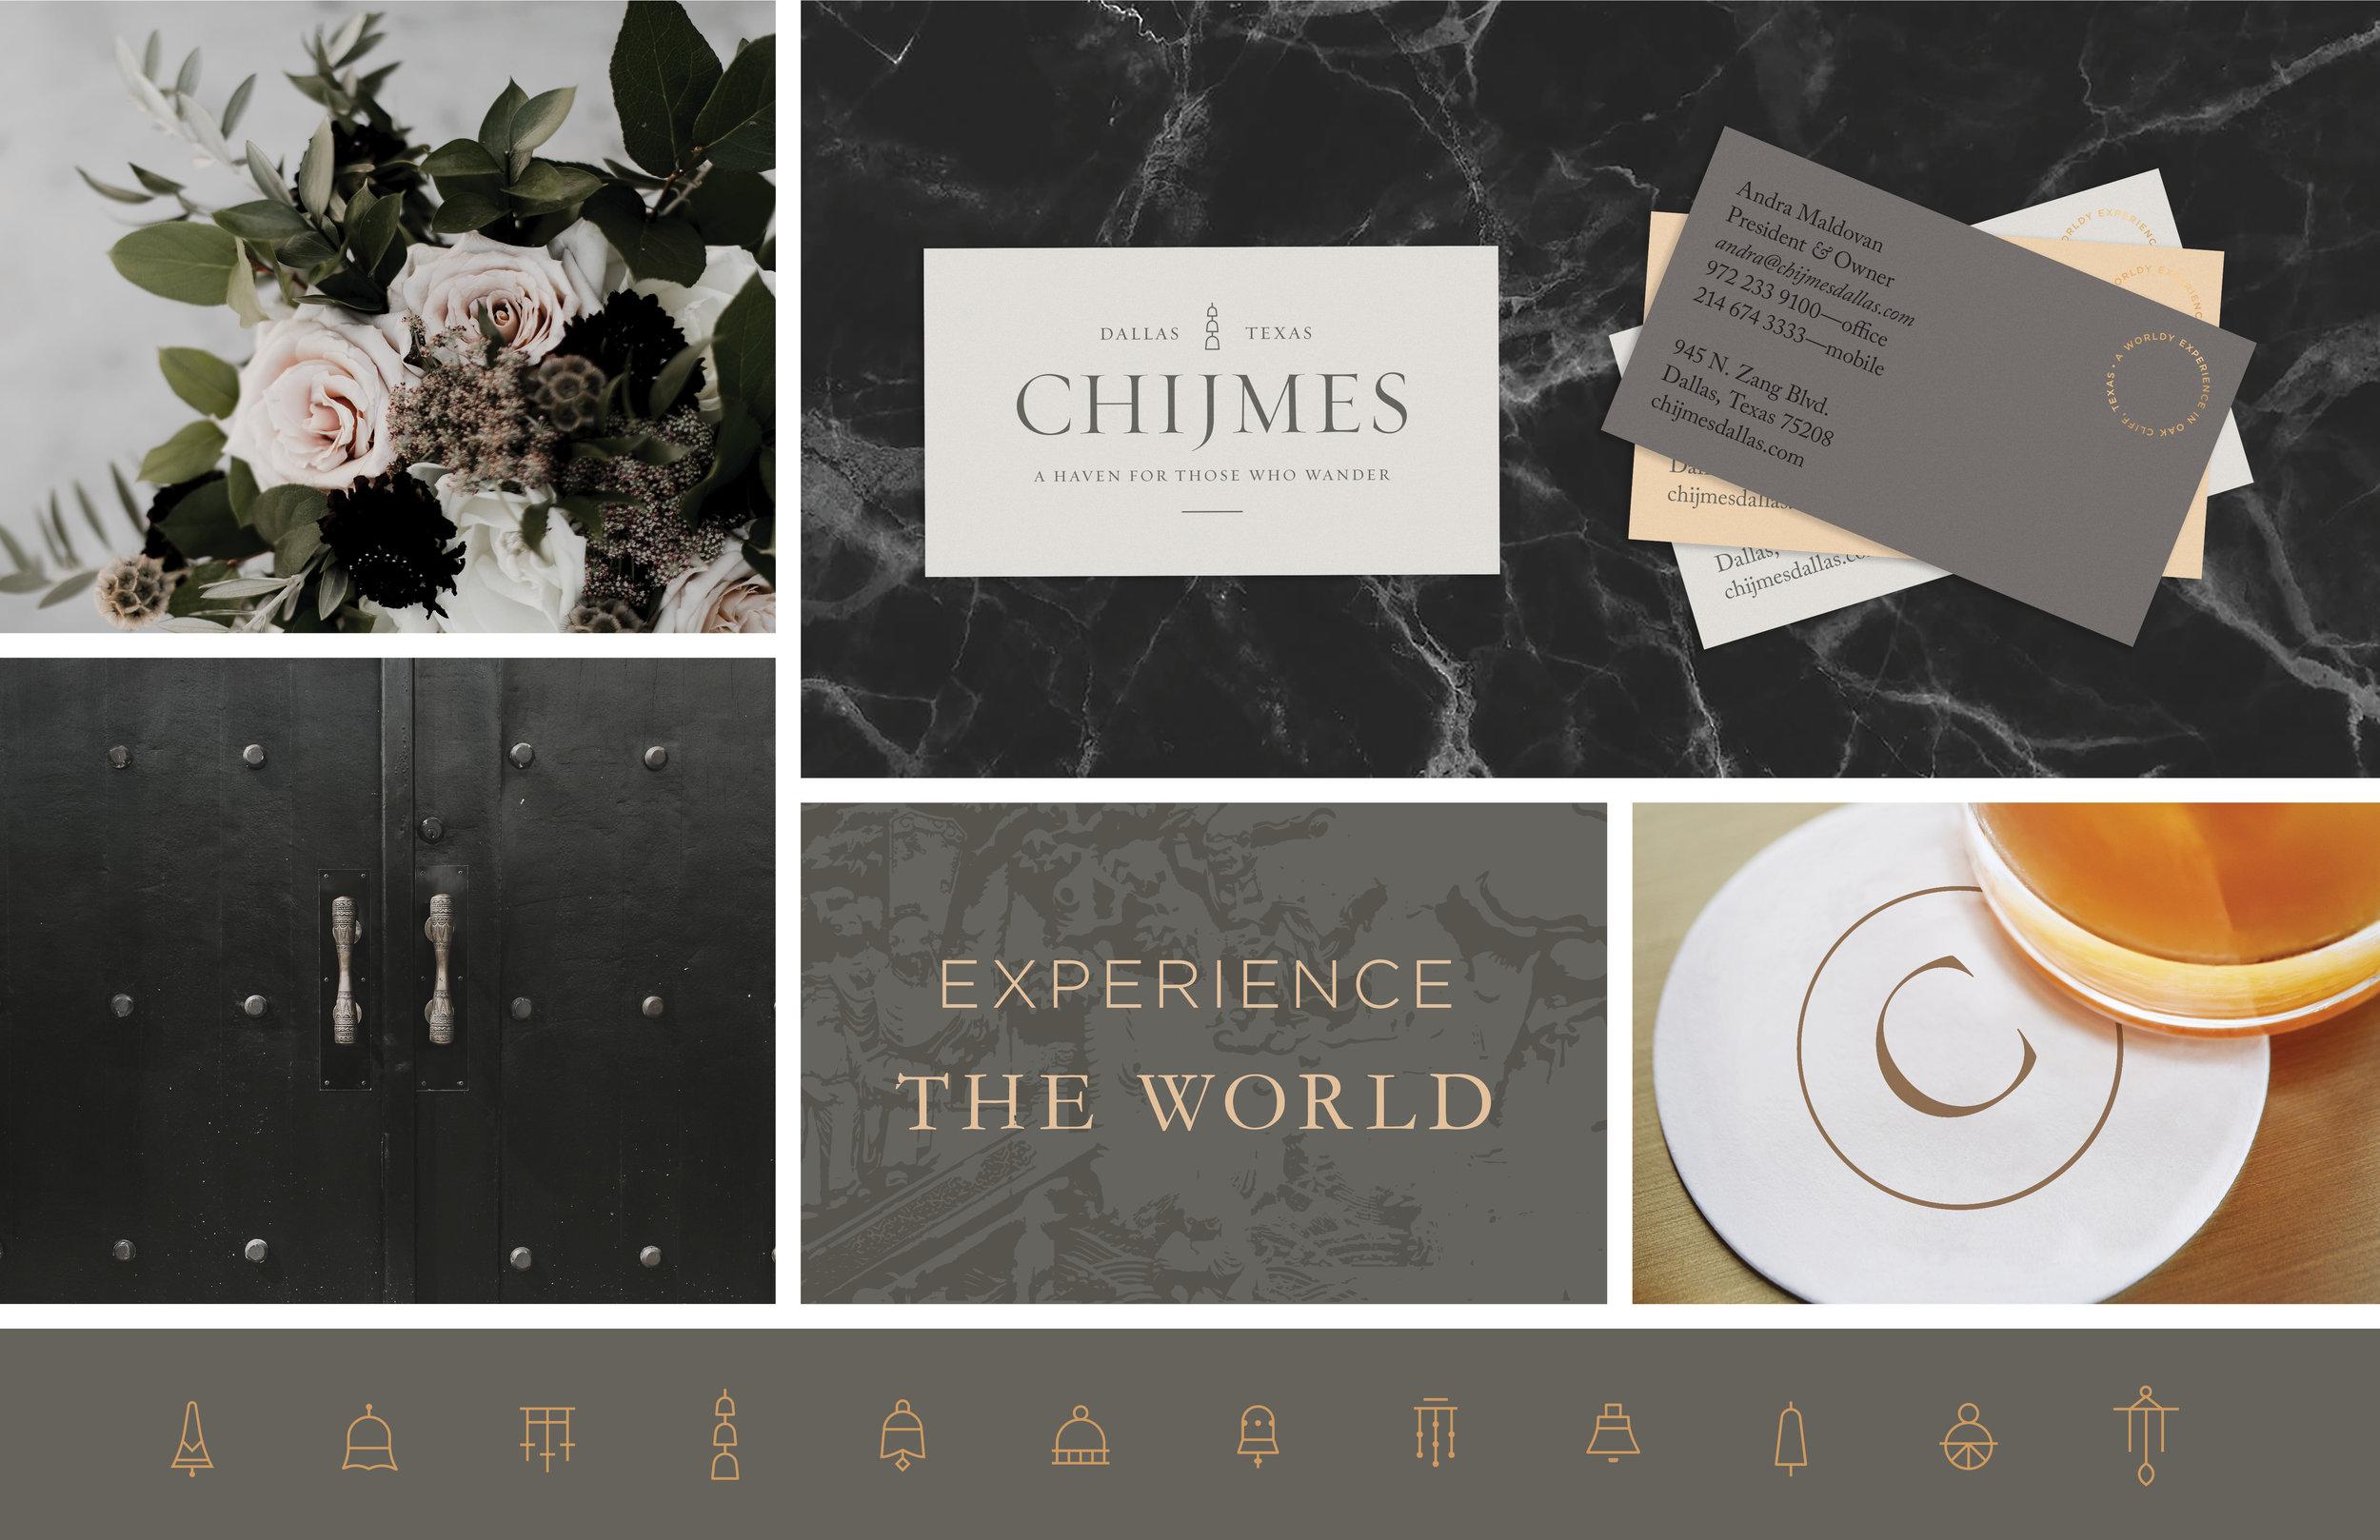 2019-ADDYs_Branding-CHIJMES3.jpg